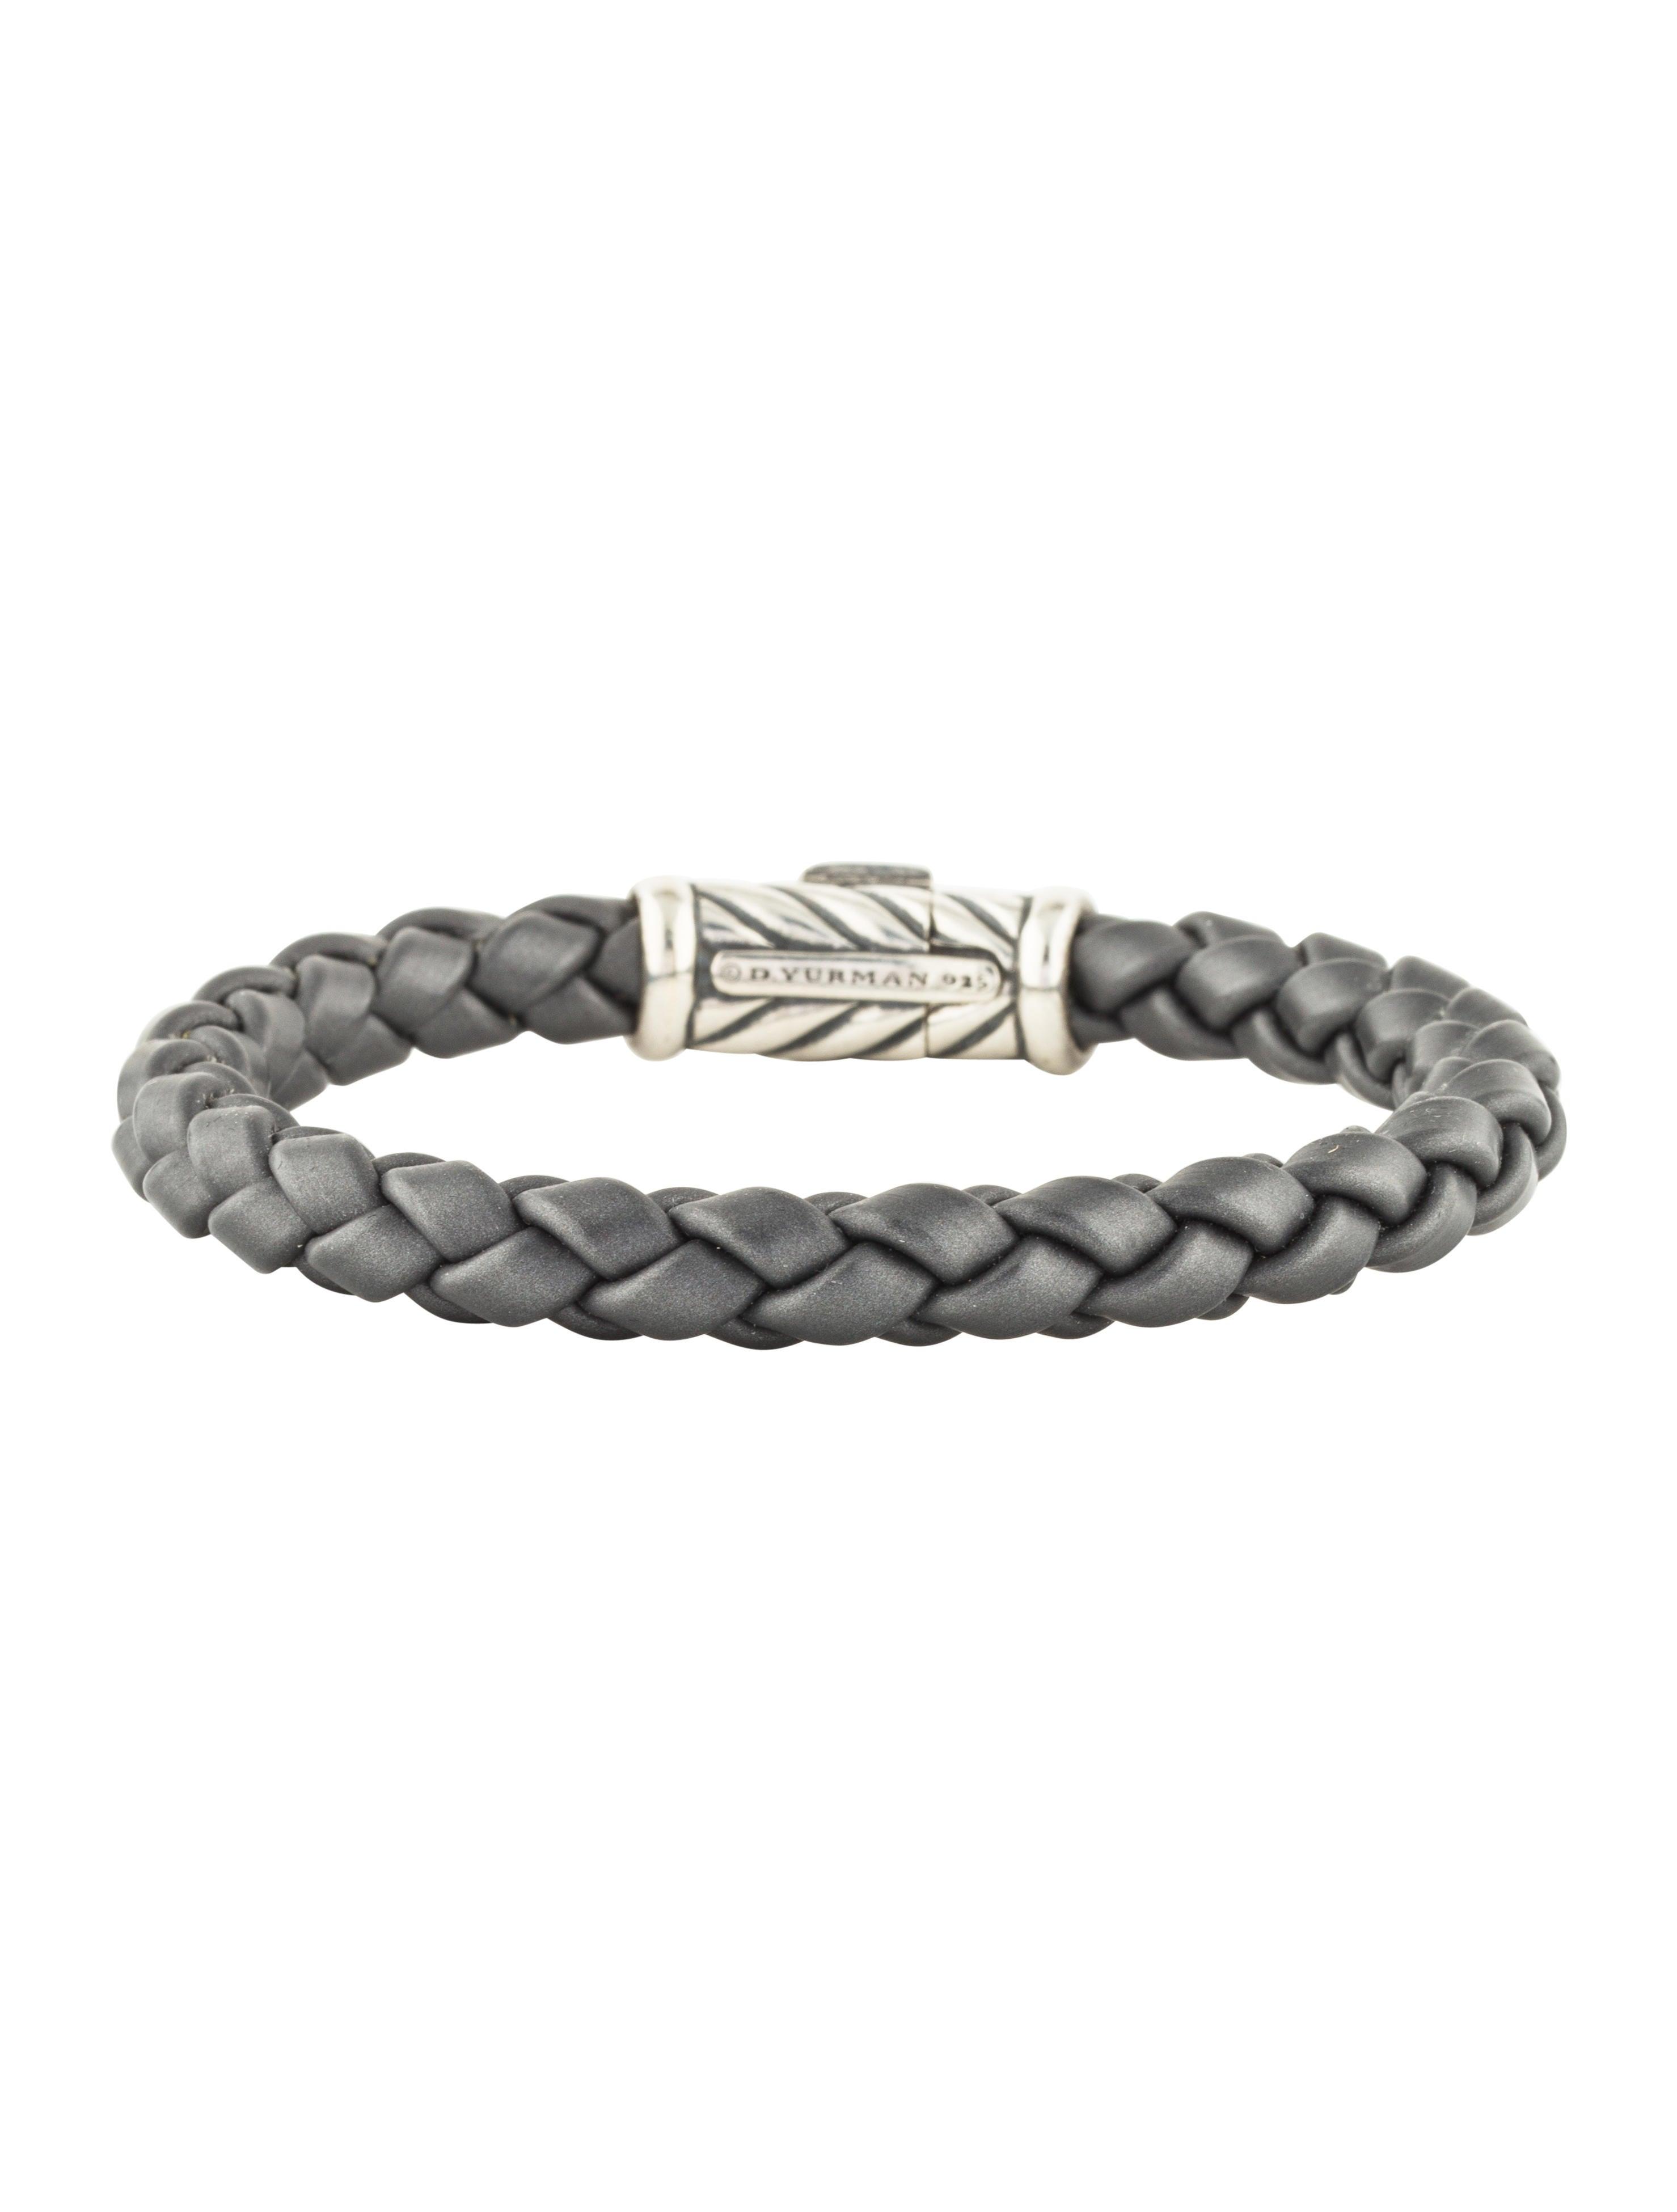 39aedbe42cab0 David Yurman Chevron Rubber Weave Bangle - Bracelets - DVY46209 ...